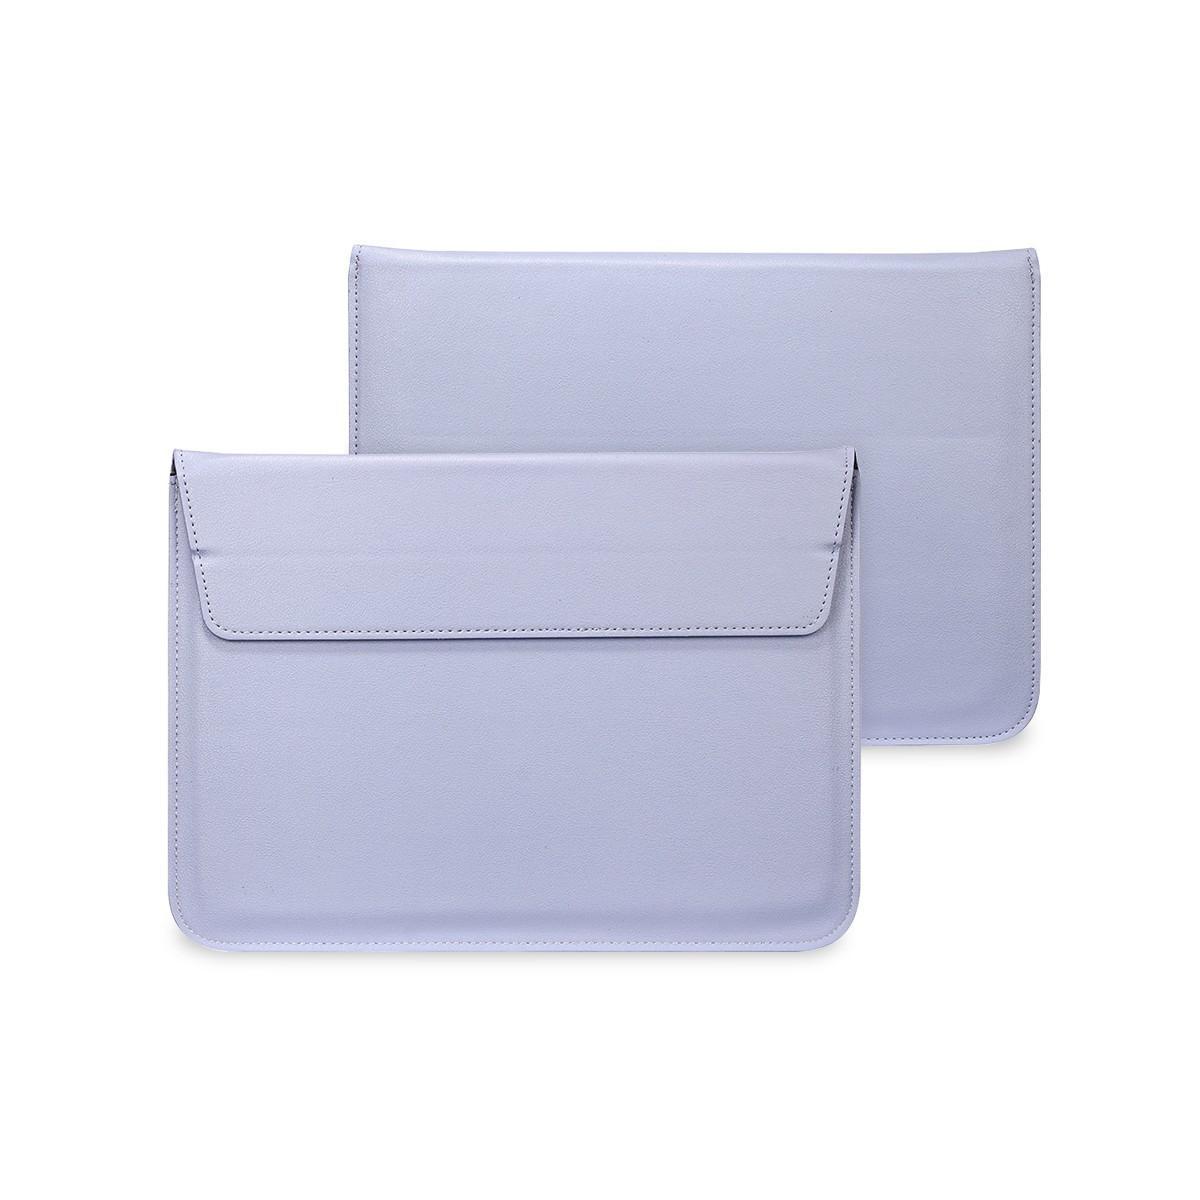 Чехол-конверт Palmexx для Apple MacBook Air 13/Pro Retina 13 (PX/Laet New AIR13) Lavenderдля Apple MacBook Air 13<br>Чехол-конверт Palmexx для Apple MacBook Air 13/Pro Retina 13 (PX/Laet New AIR13) Lavender<br>